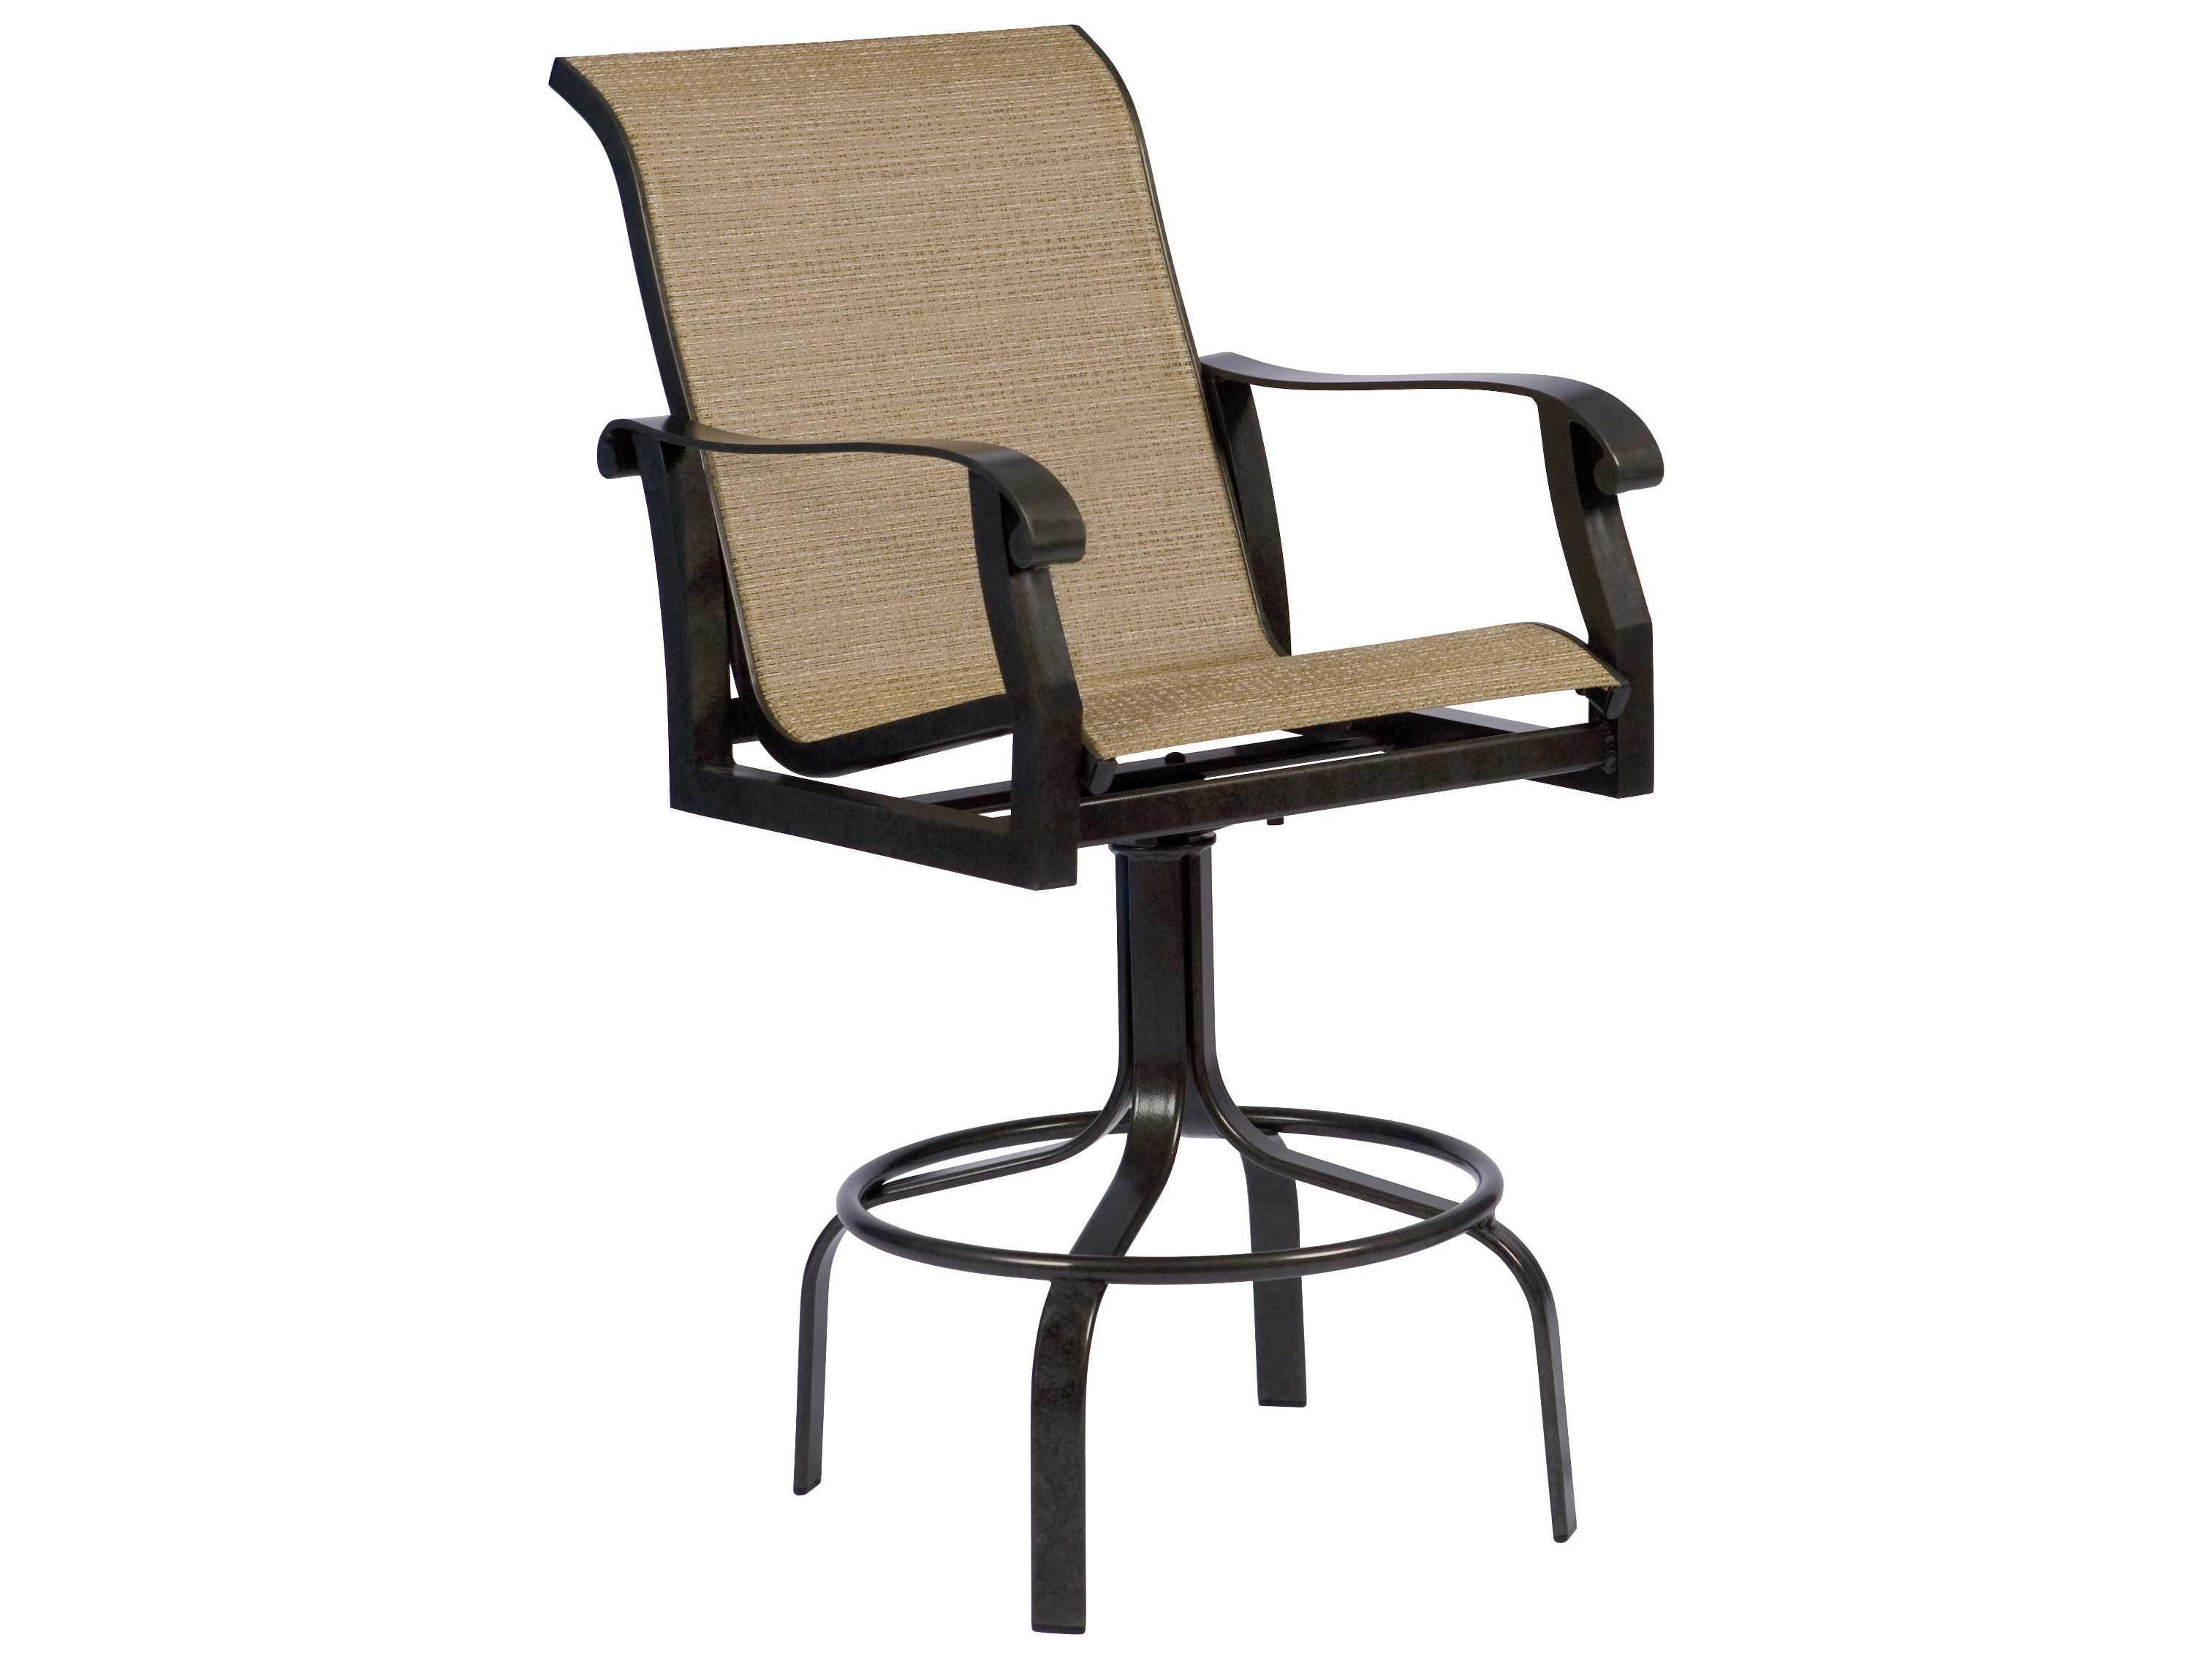 Outdoor Bar Swivel Chairs The Malibu Collection Swivel Bar Stool